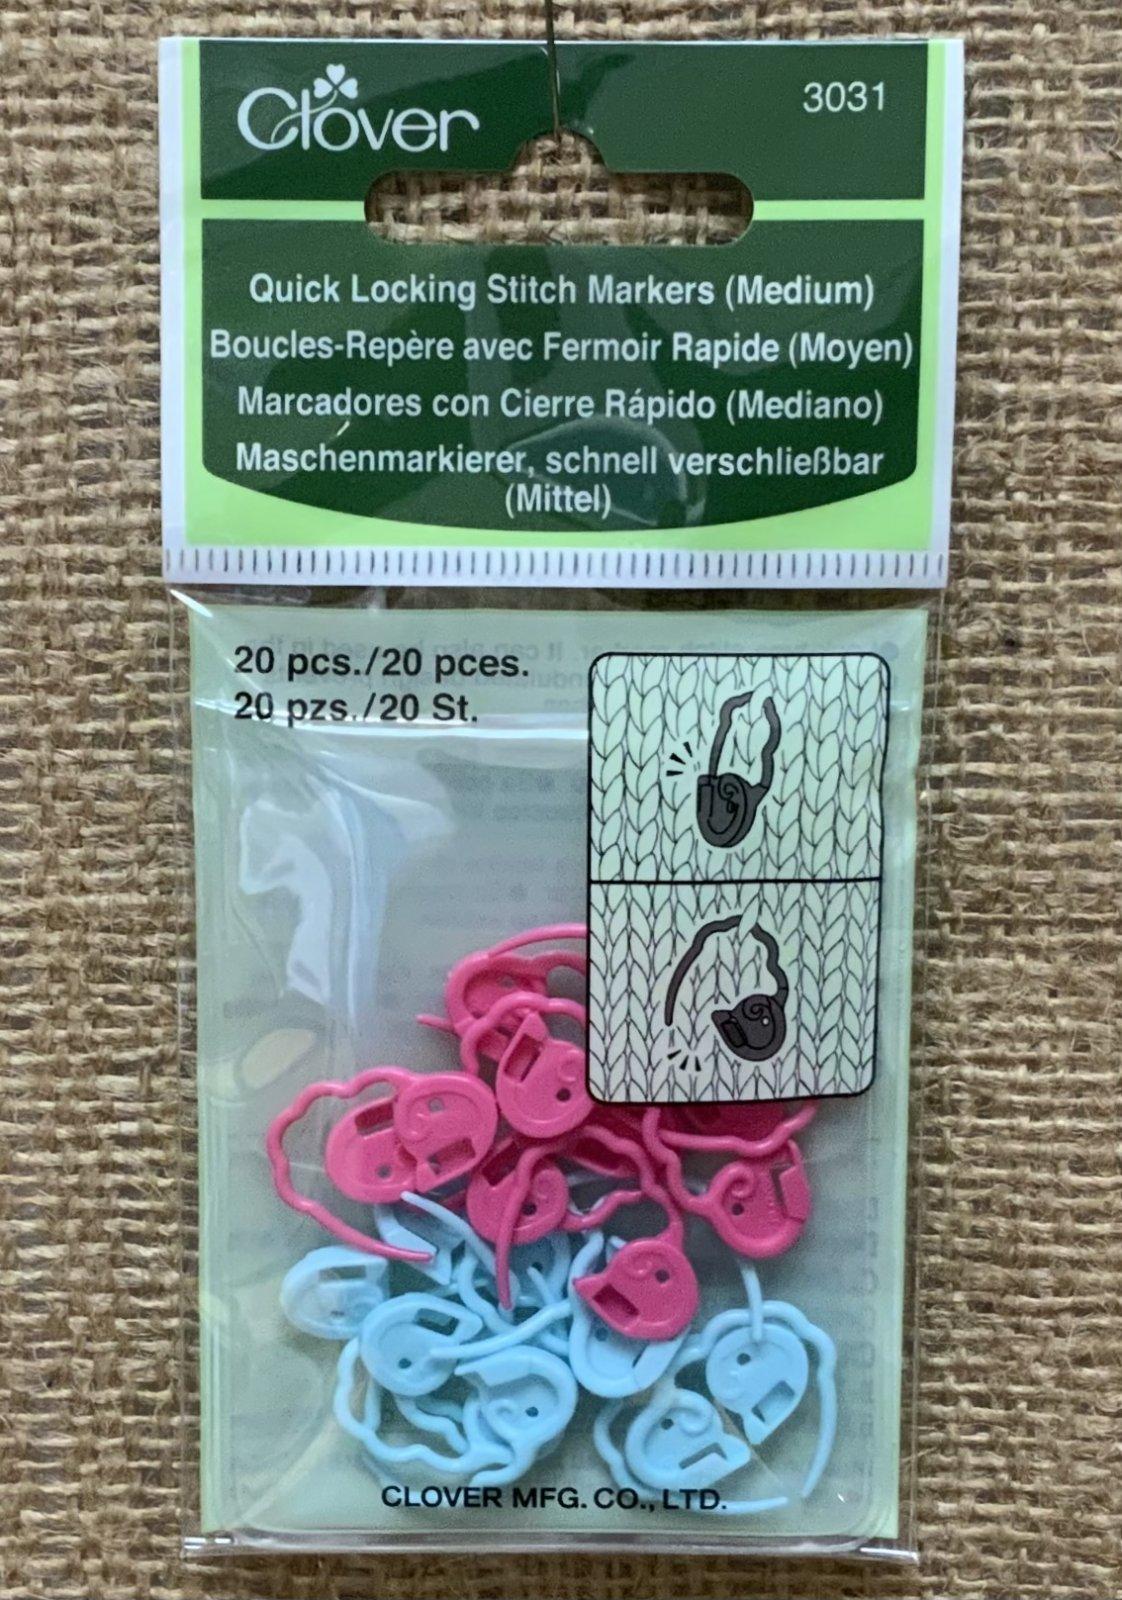 Clover Quick Locking Stitch Markers